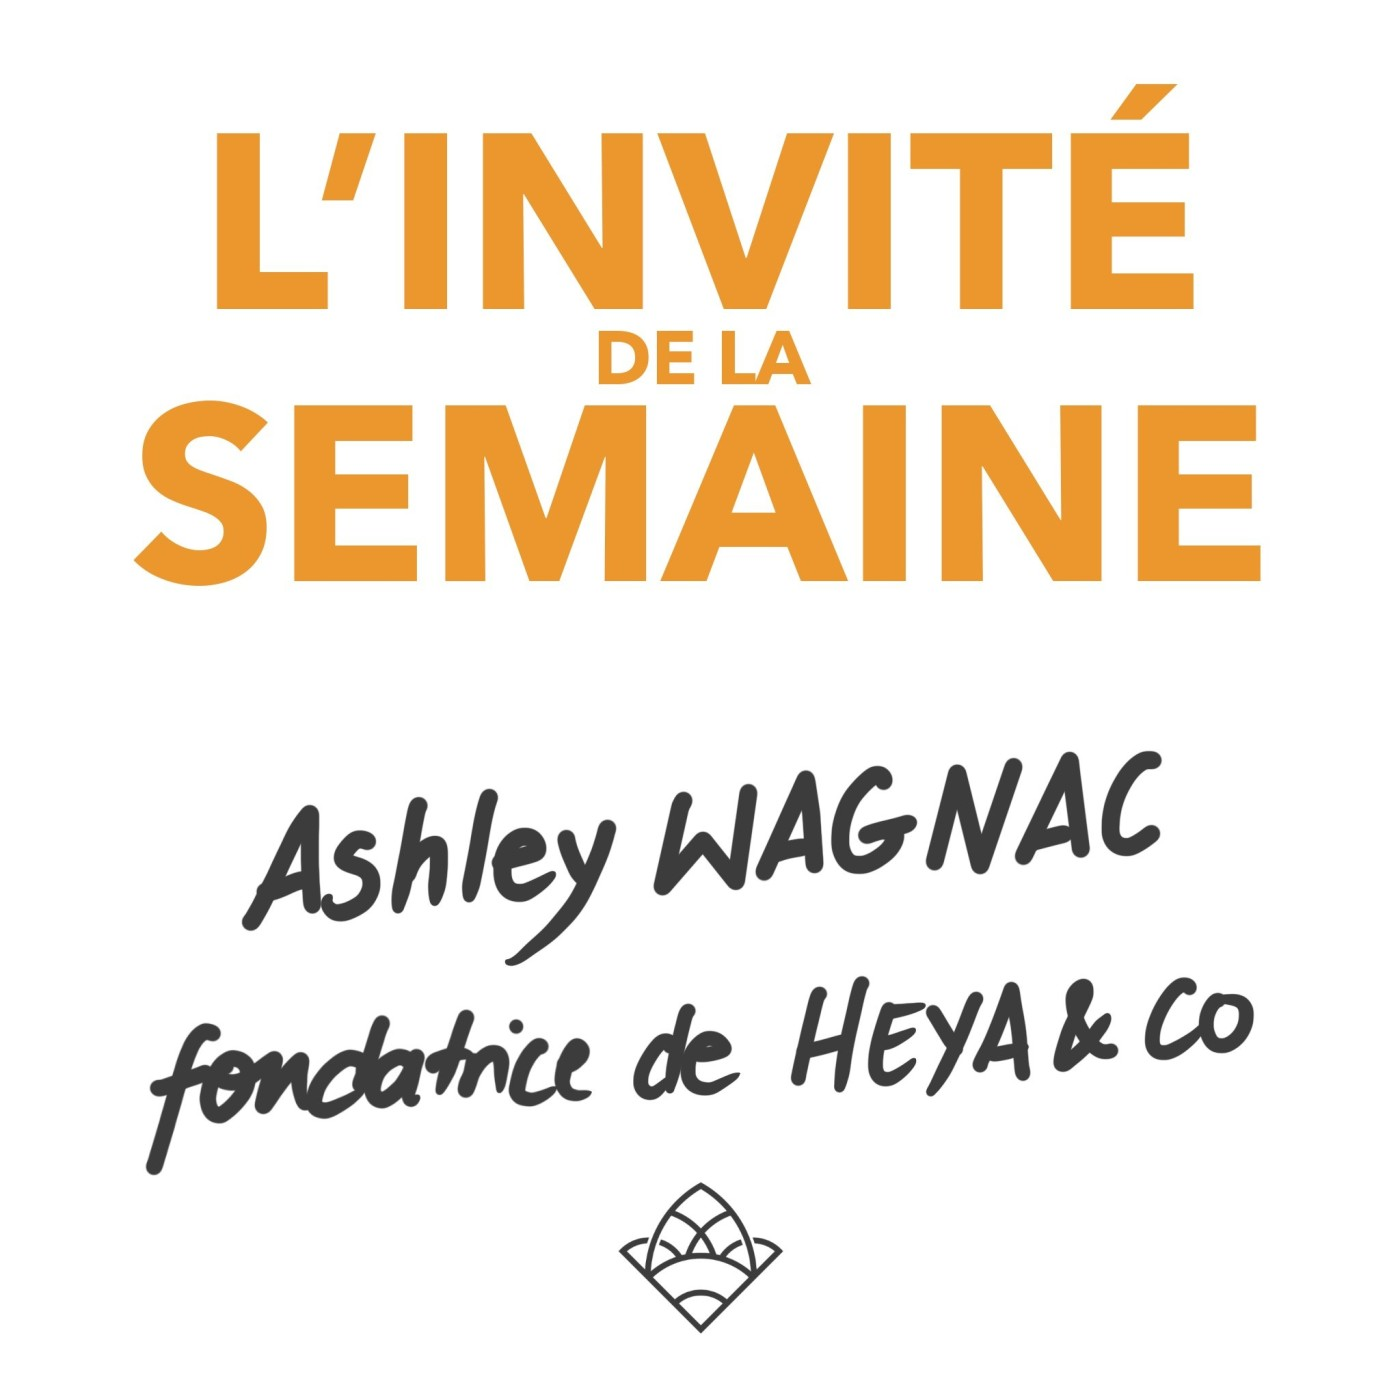 (invité #17) Ashley Wagnac, fondatrice du concept store Heya & co